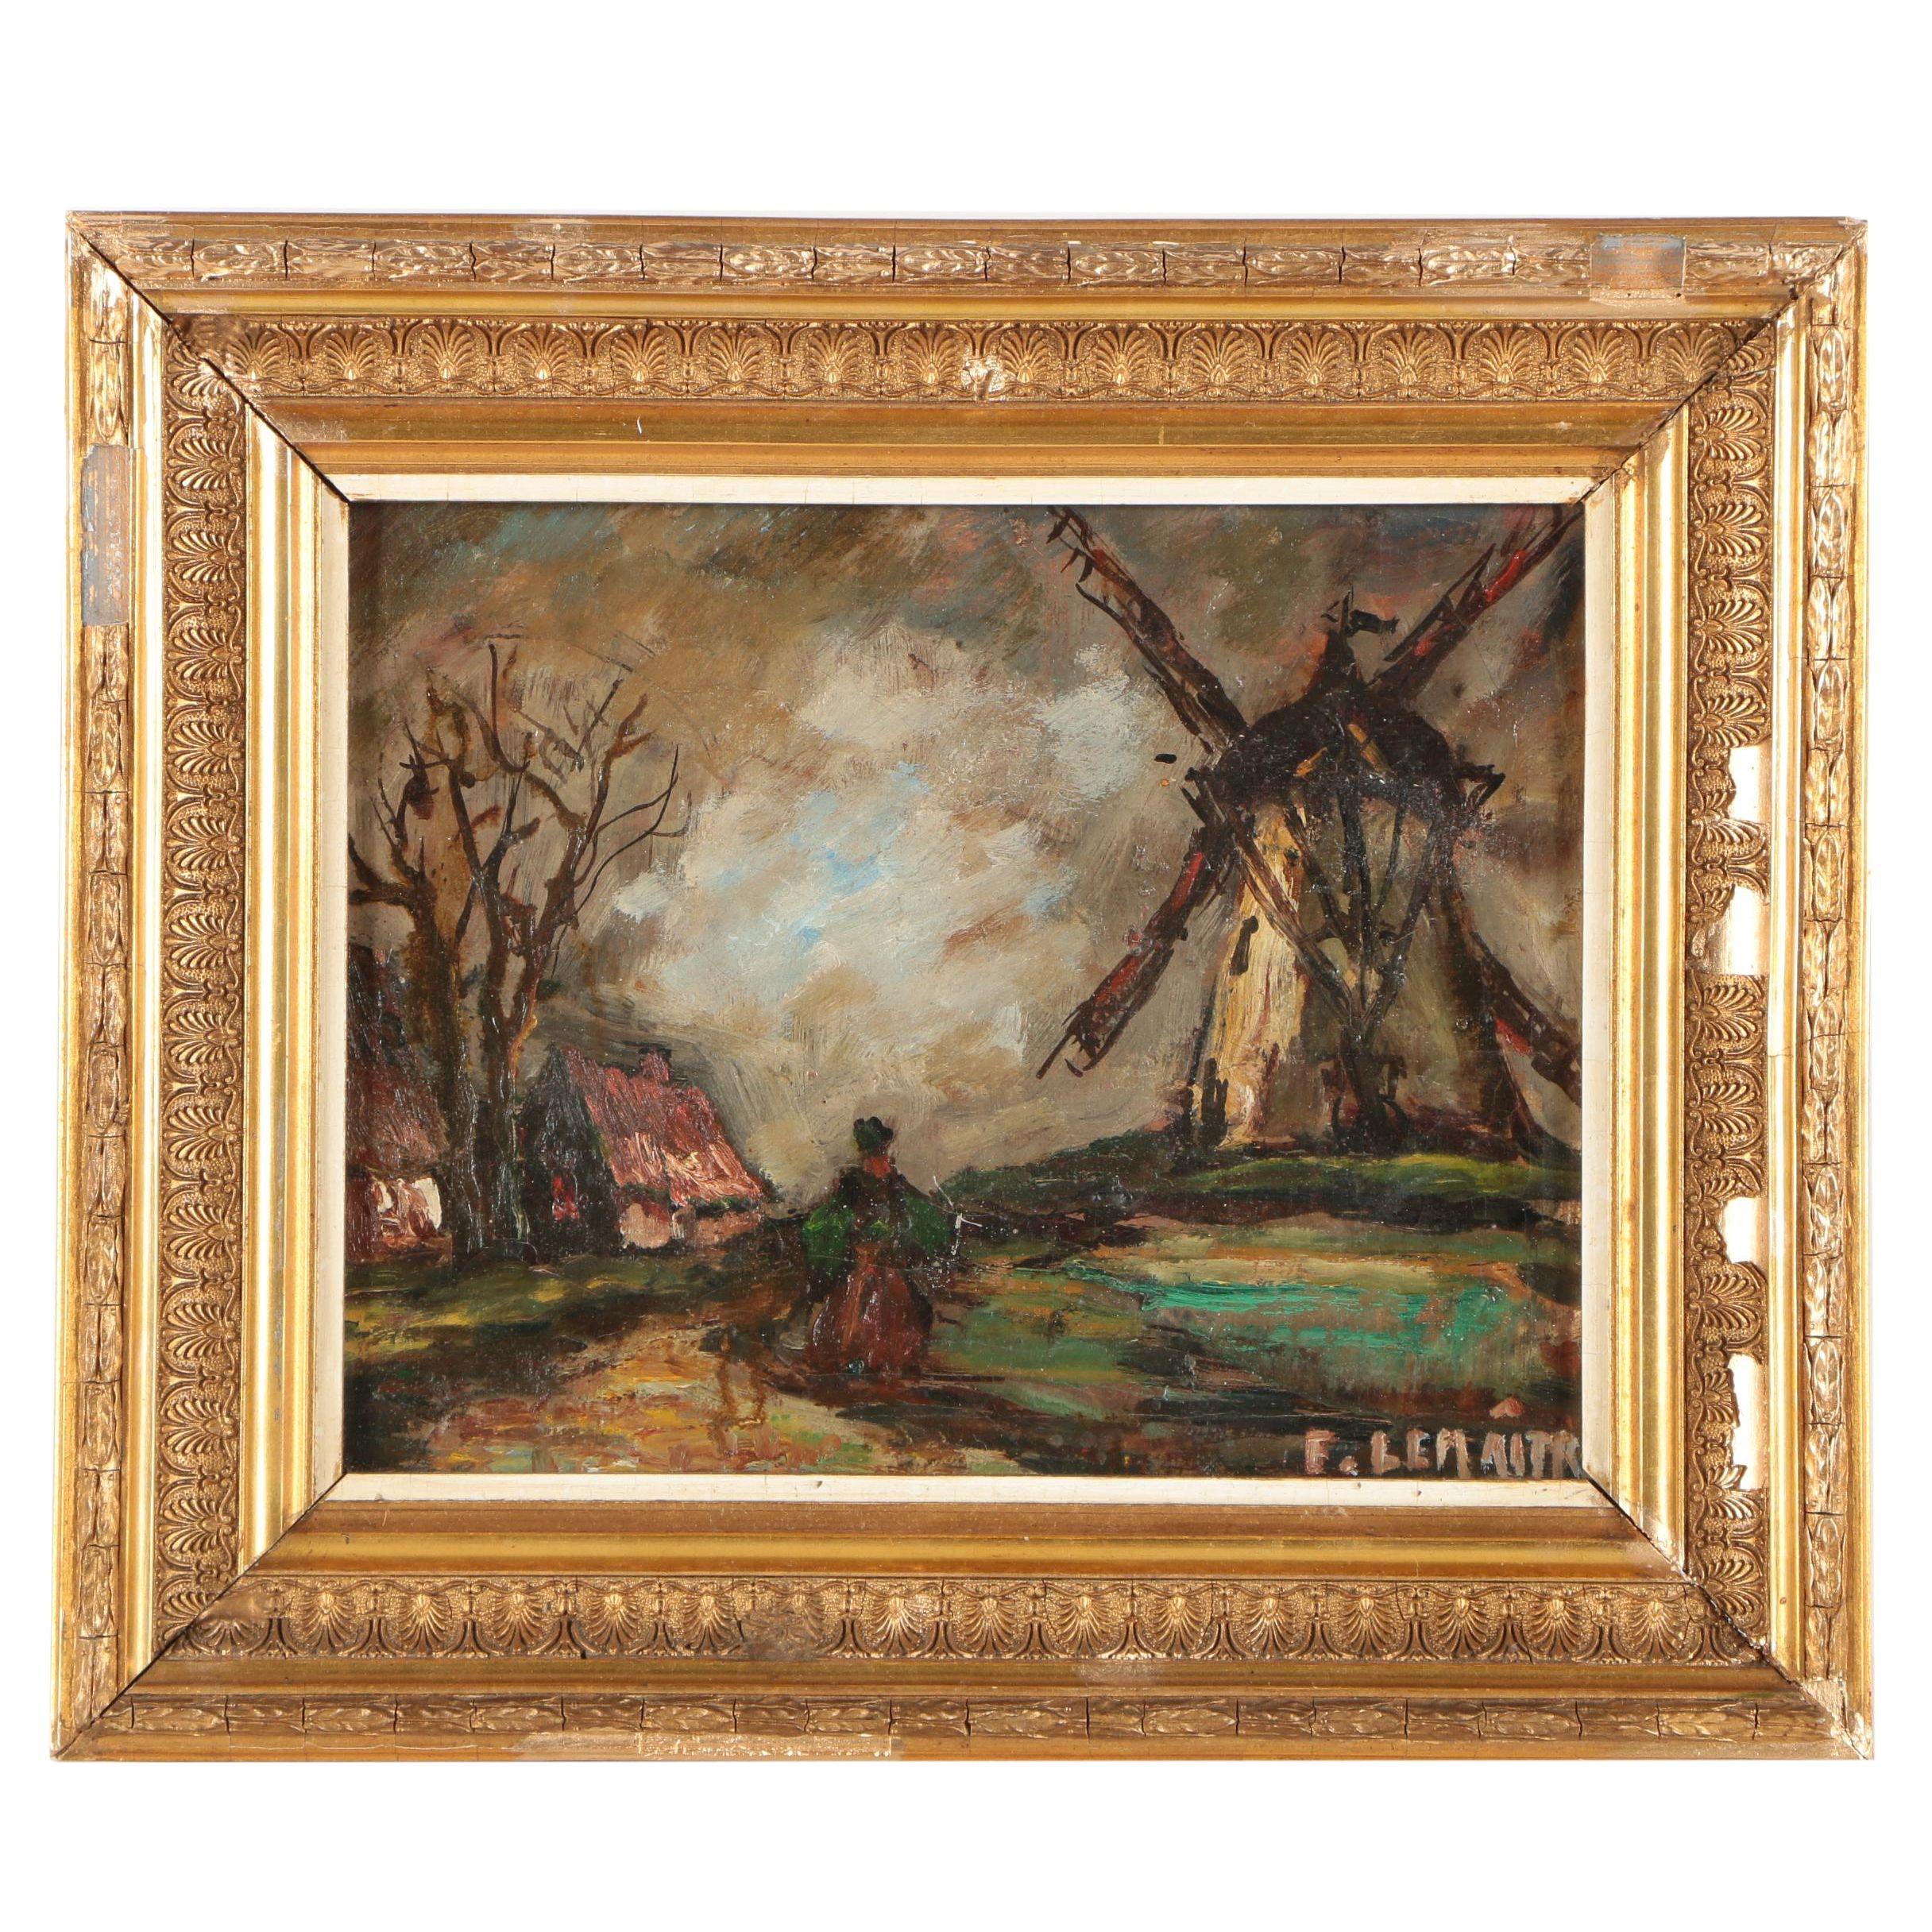 F. Lemaitre Oil Painting